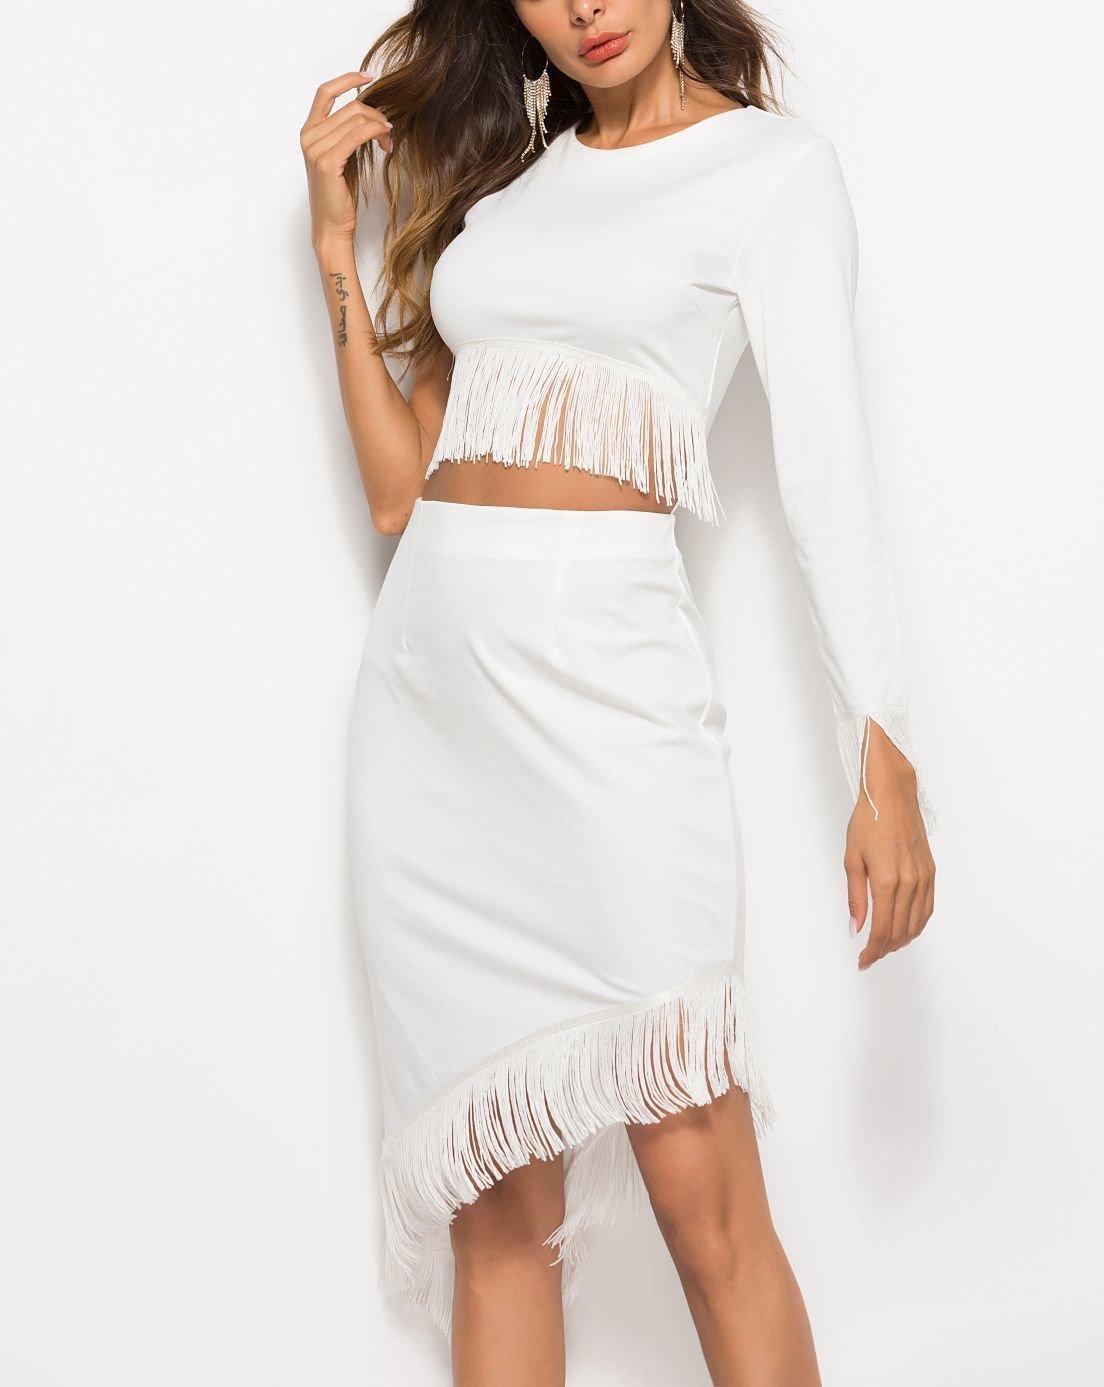 Two-Piece Club Dress with Fringe